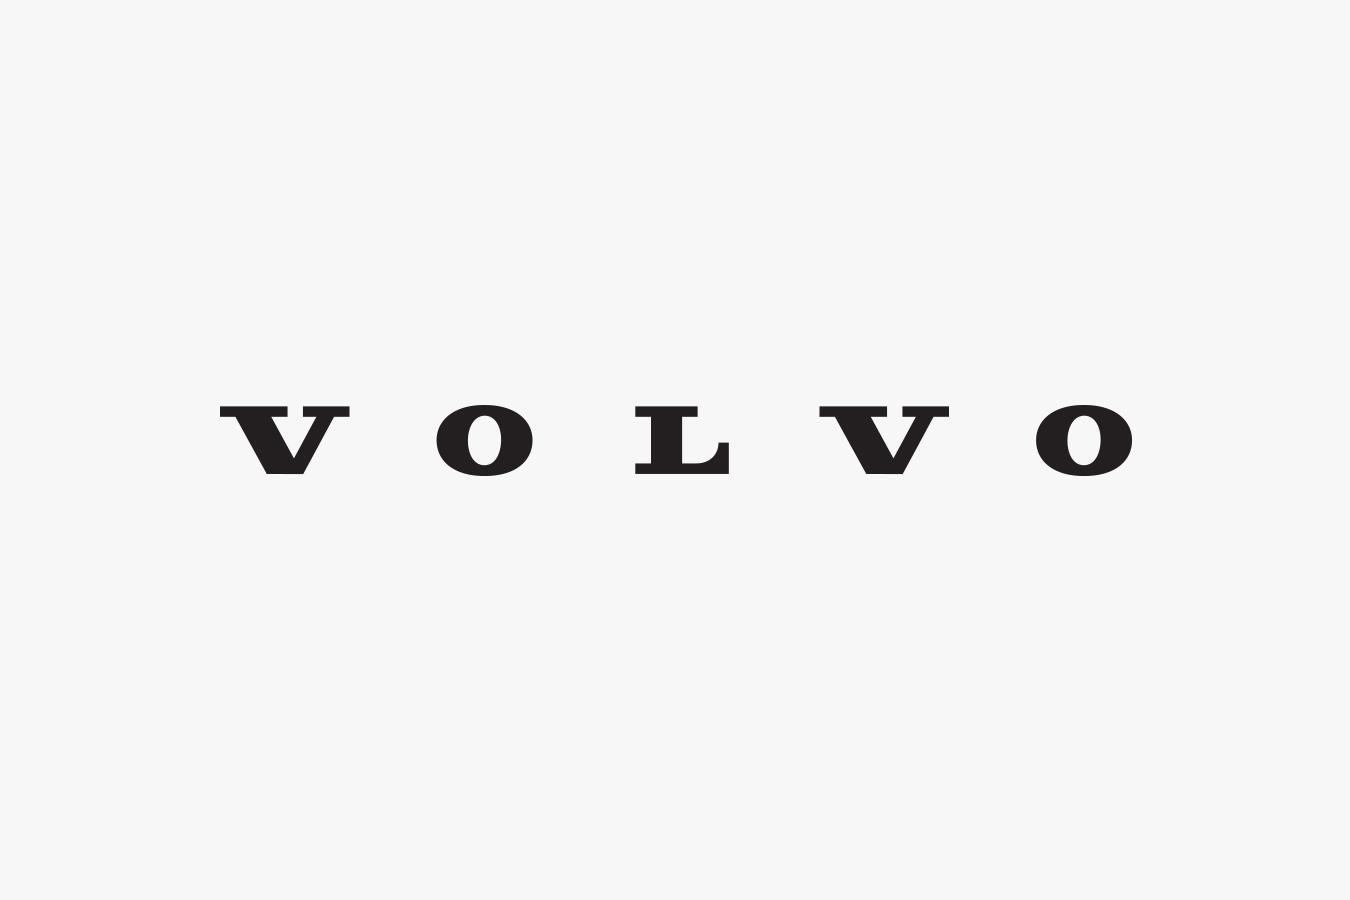 www.media.volvocars.com